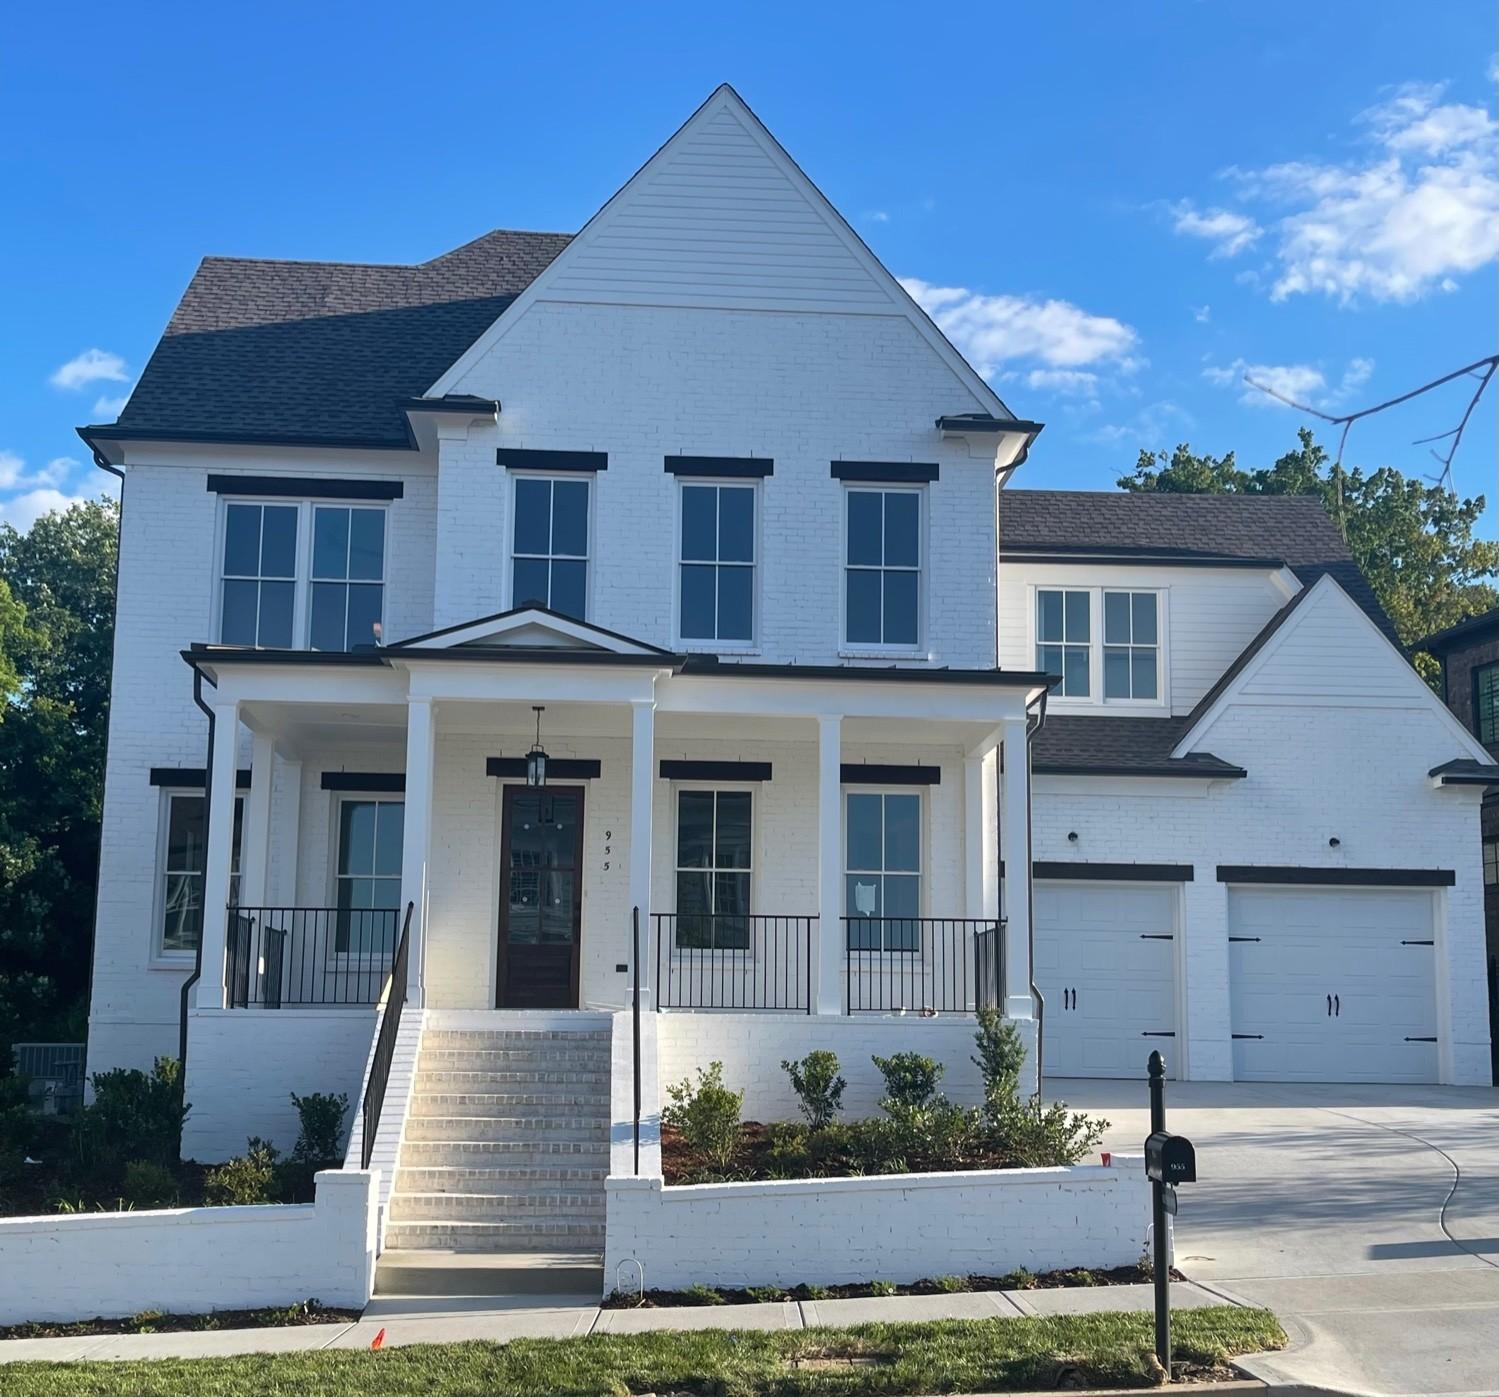 955 Cheltenham Ave, Lot # 2136 Property Photo